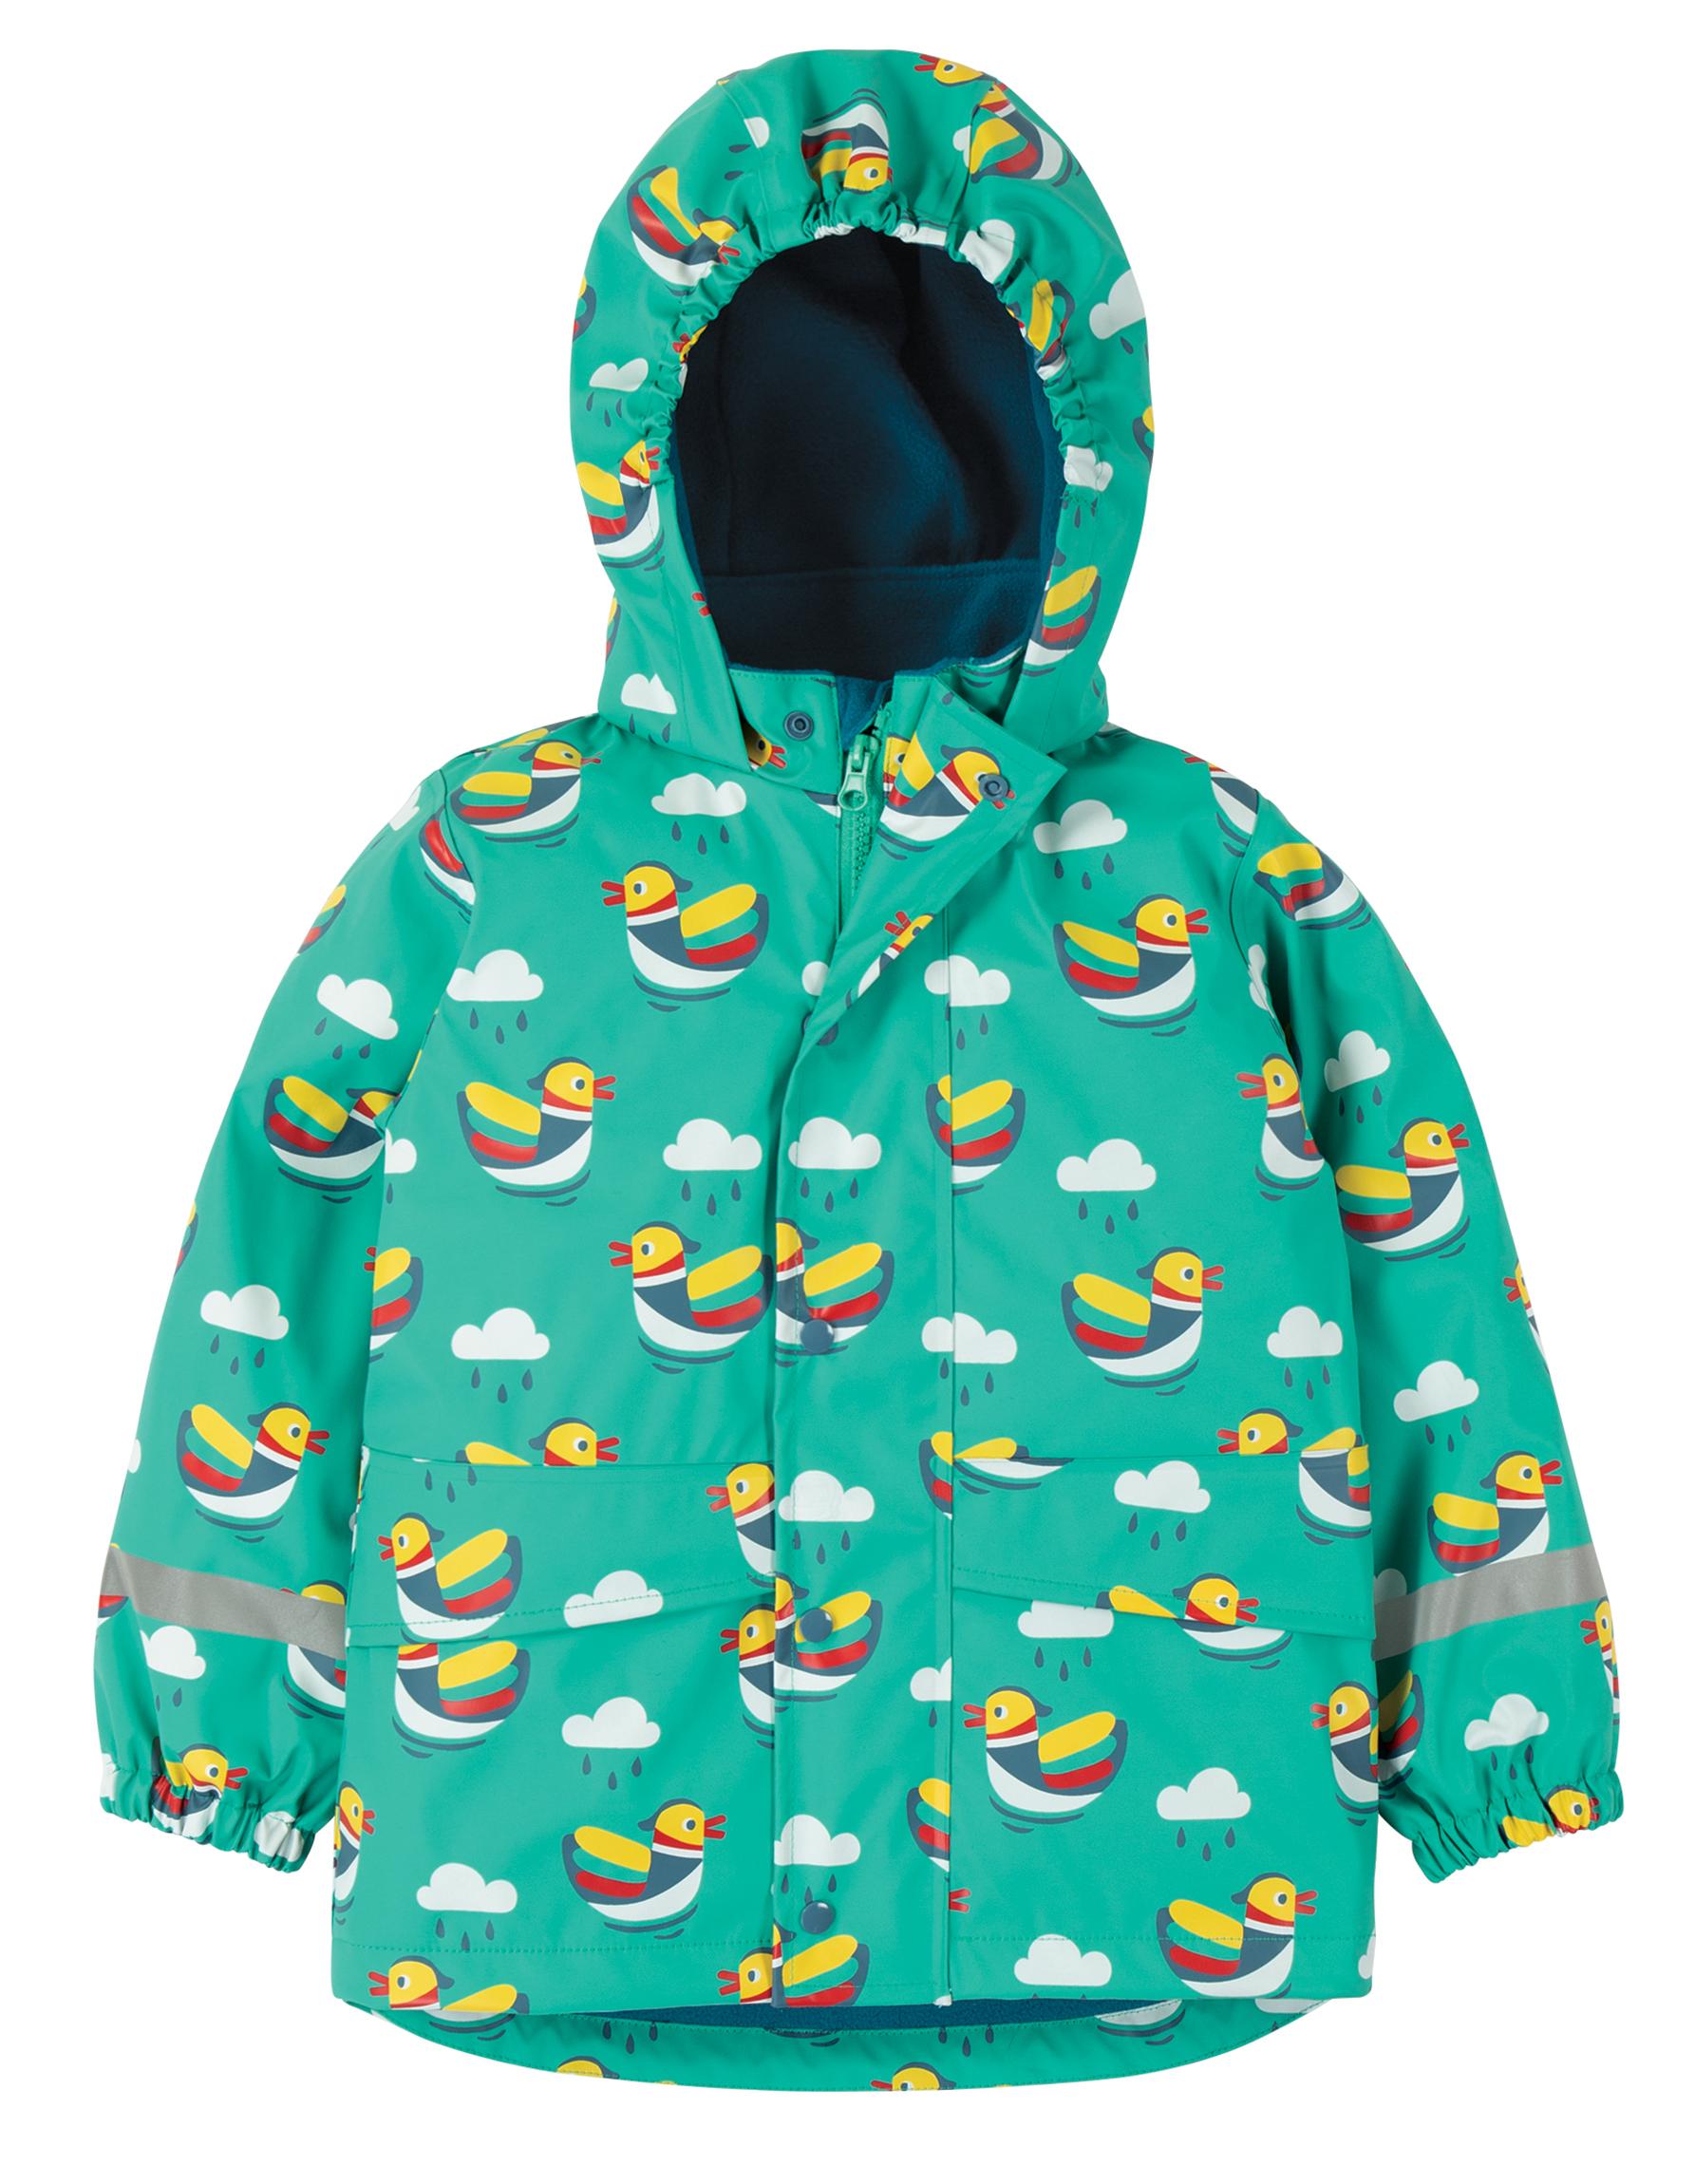 Frugi - puddle buster coat - Pacific aqua mandarin ducks